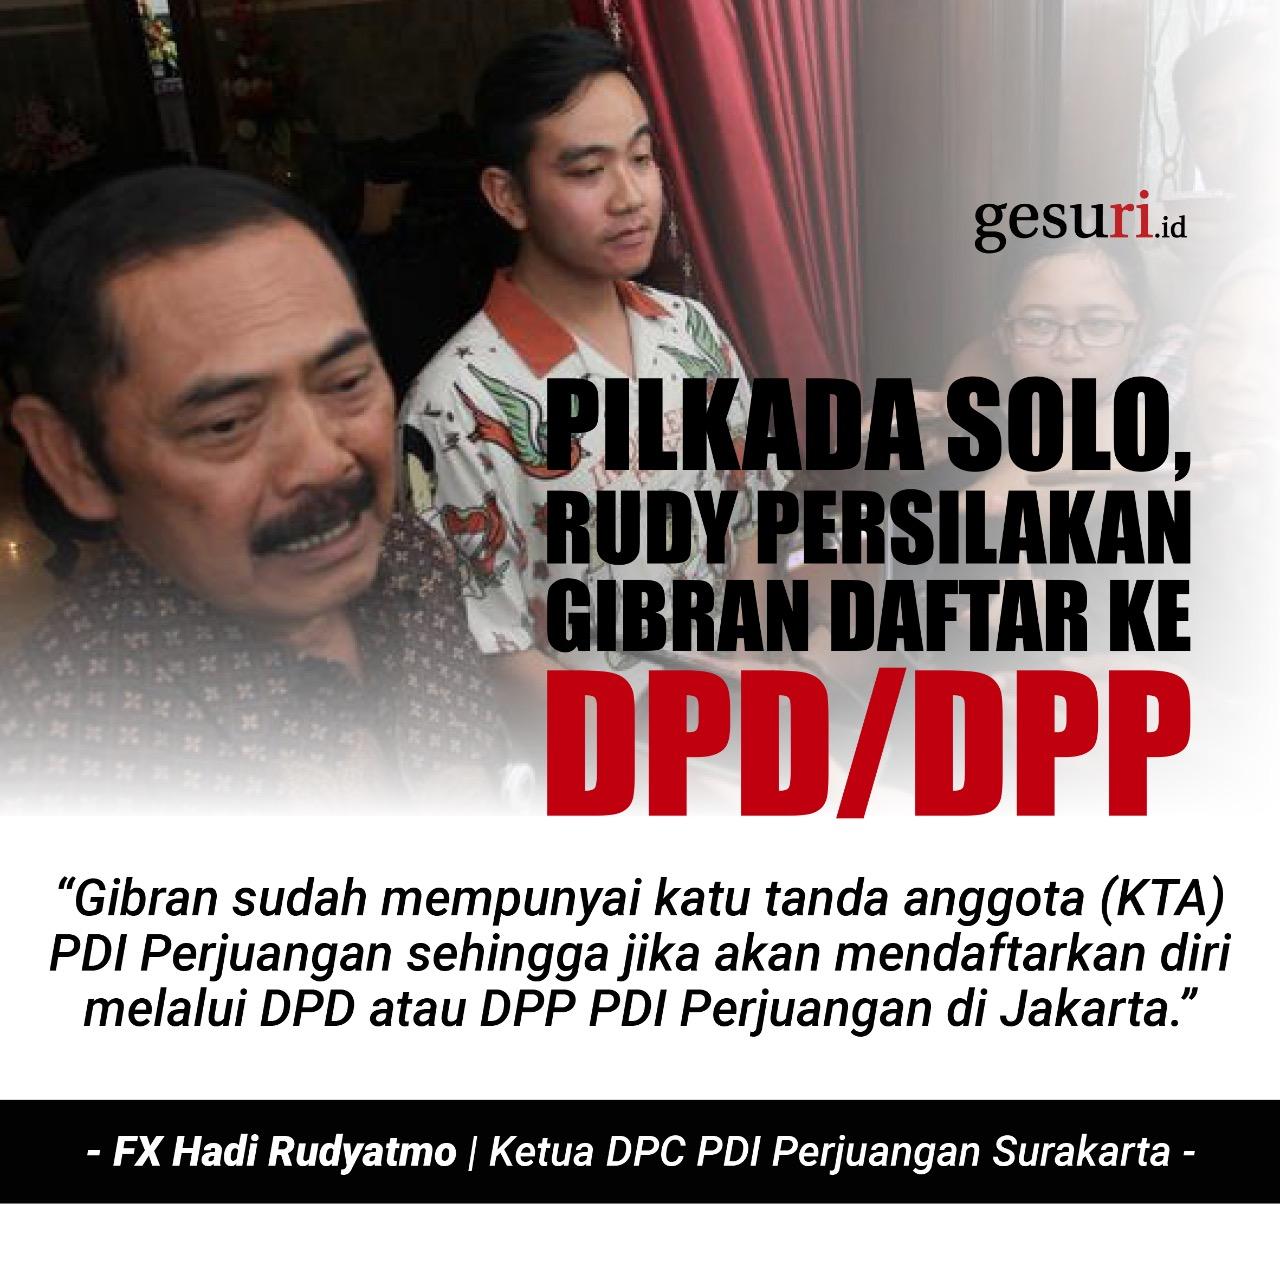 Pilkada Solo, Rudy Persilakan Gibran Daftar ke DPD/DPP